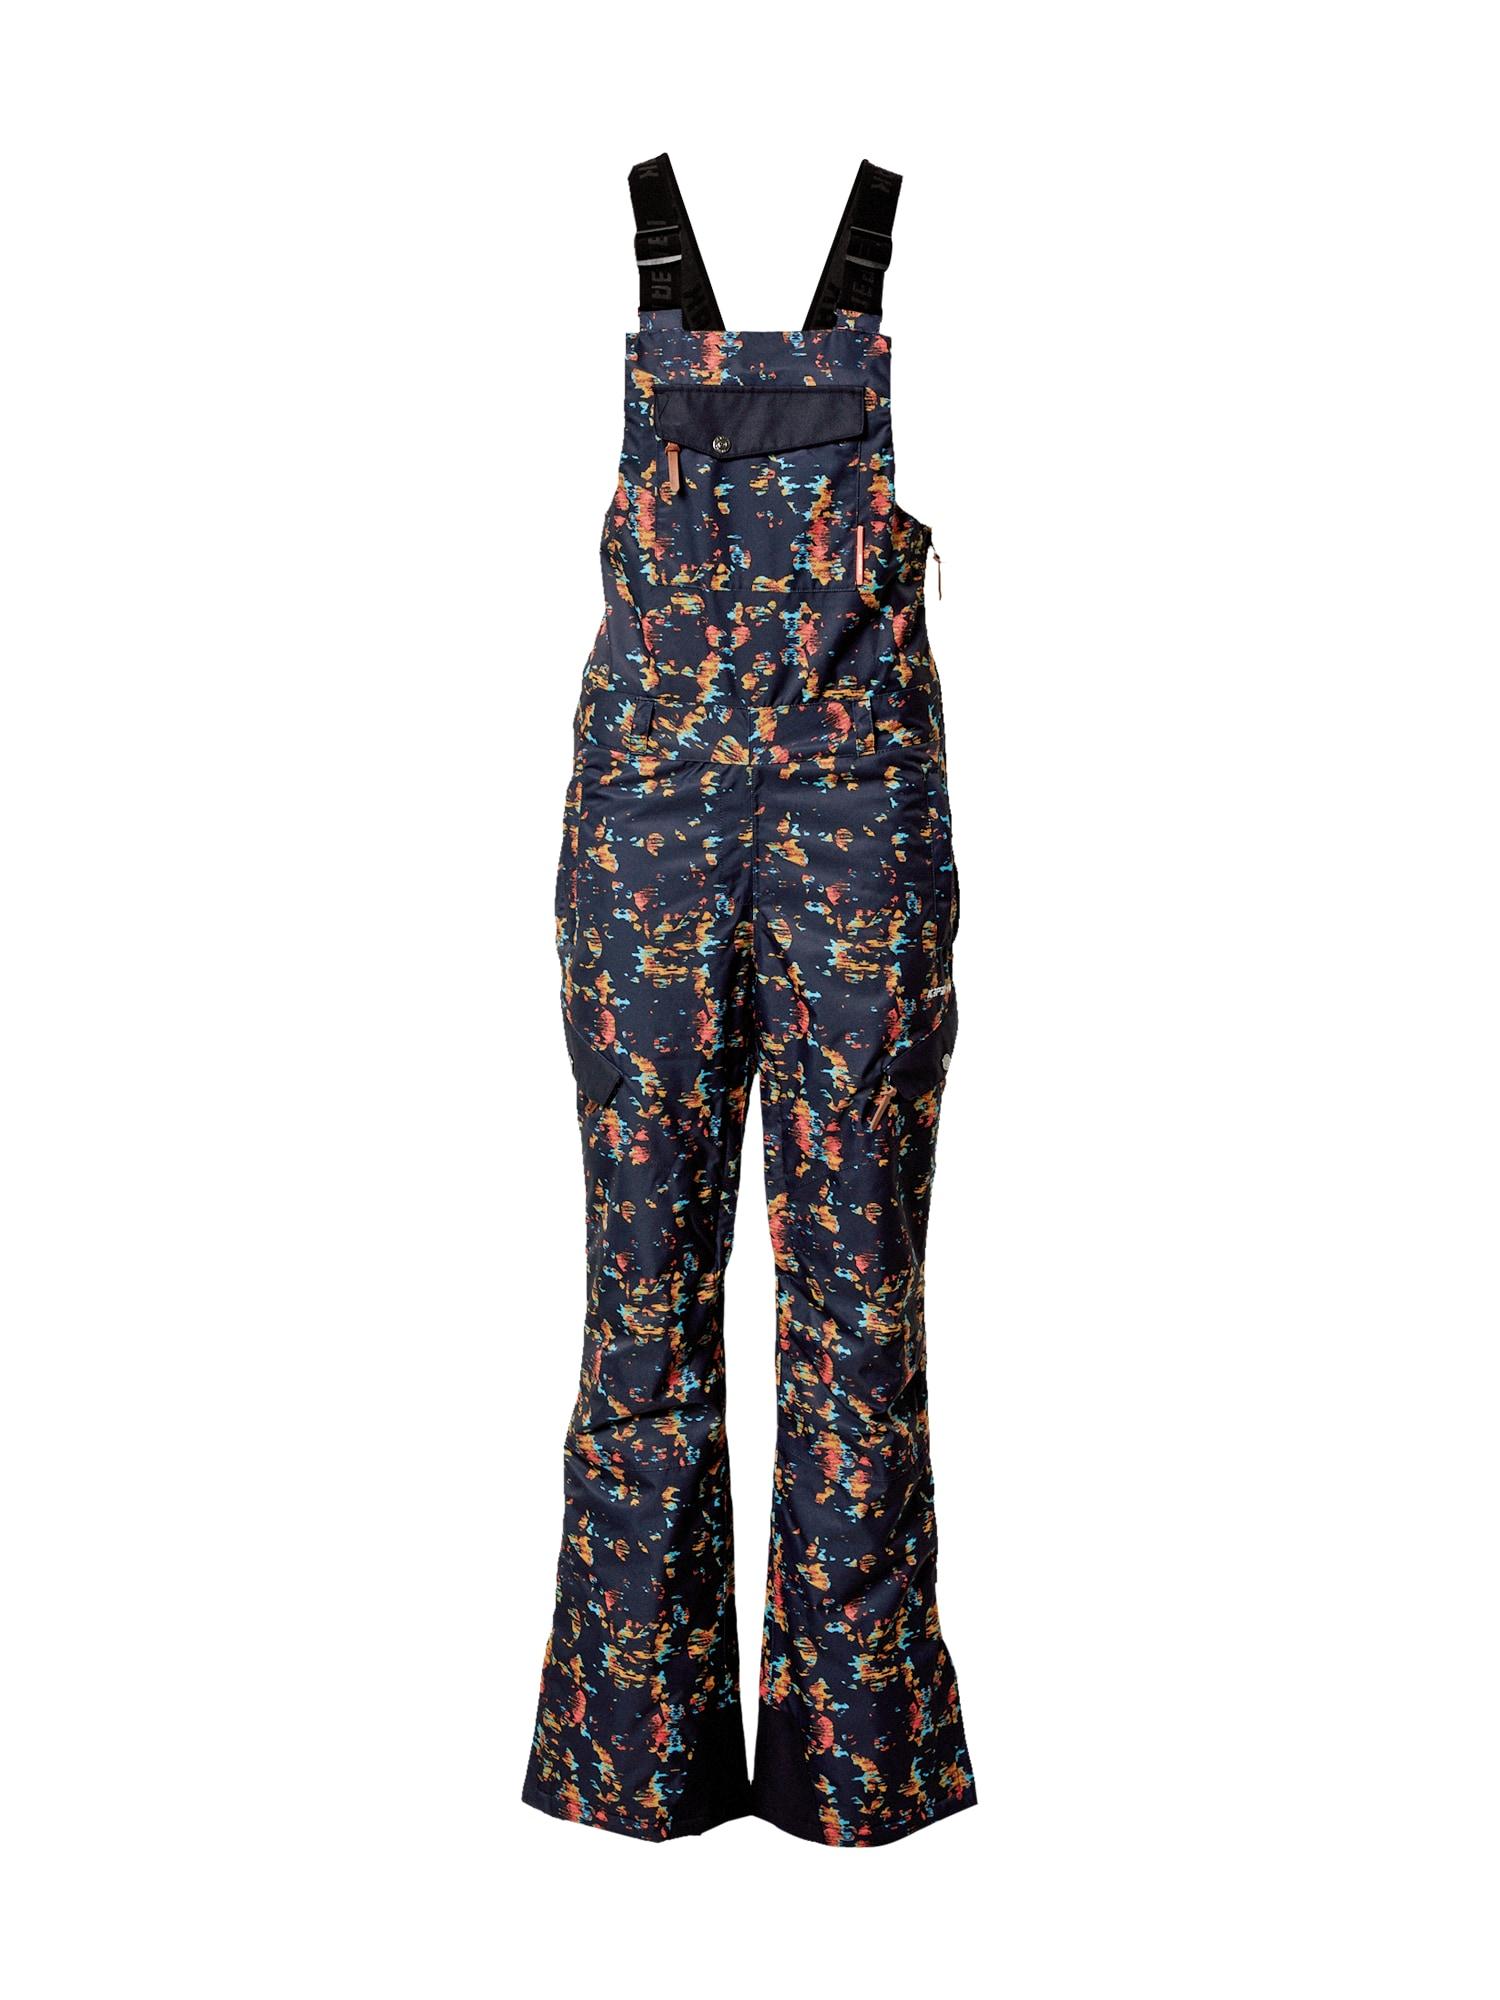 ICEPEAK Outdoorové kalhoty 'COWETA'  tmavě modrá / mix barev